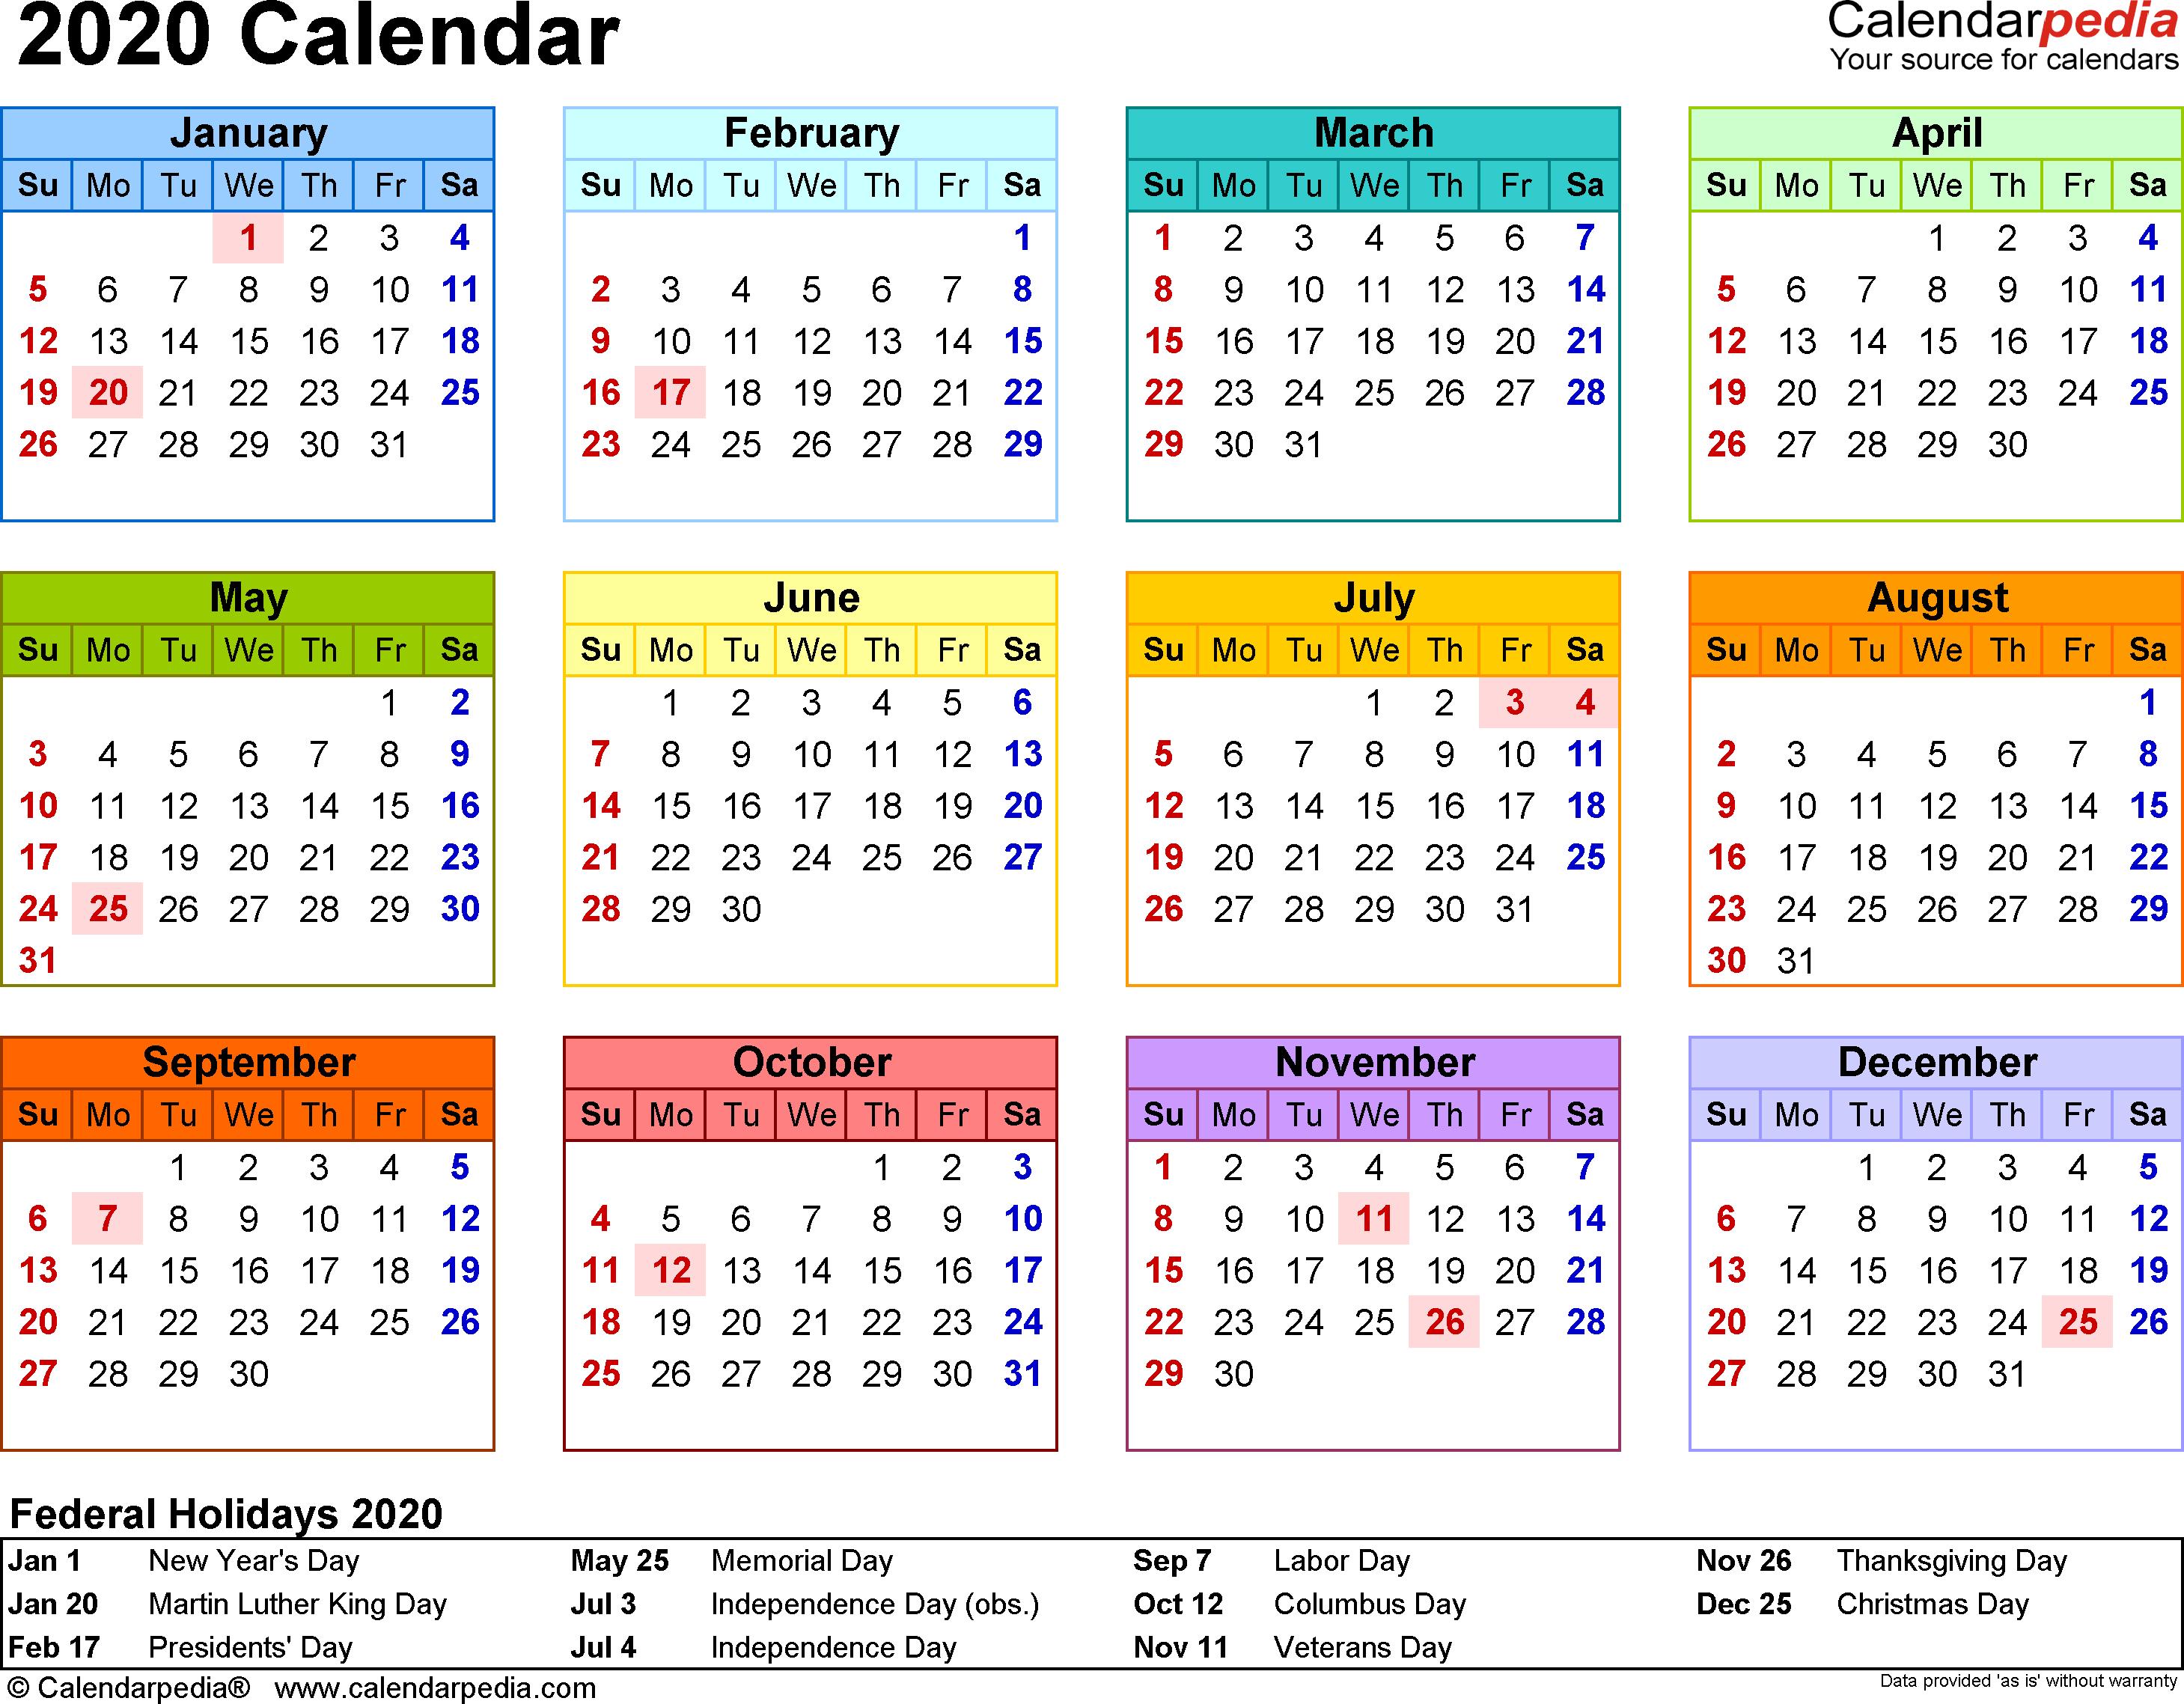 2020 Calendar - 17 Free Printable Word Calendar Templates with Free Printable Weekly Calendar 2020